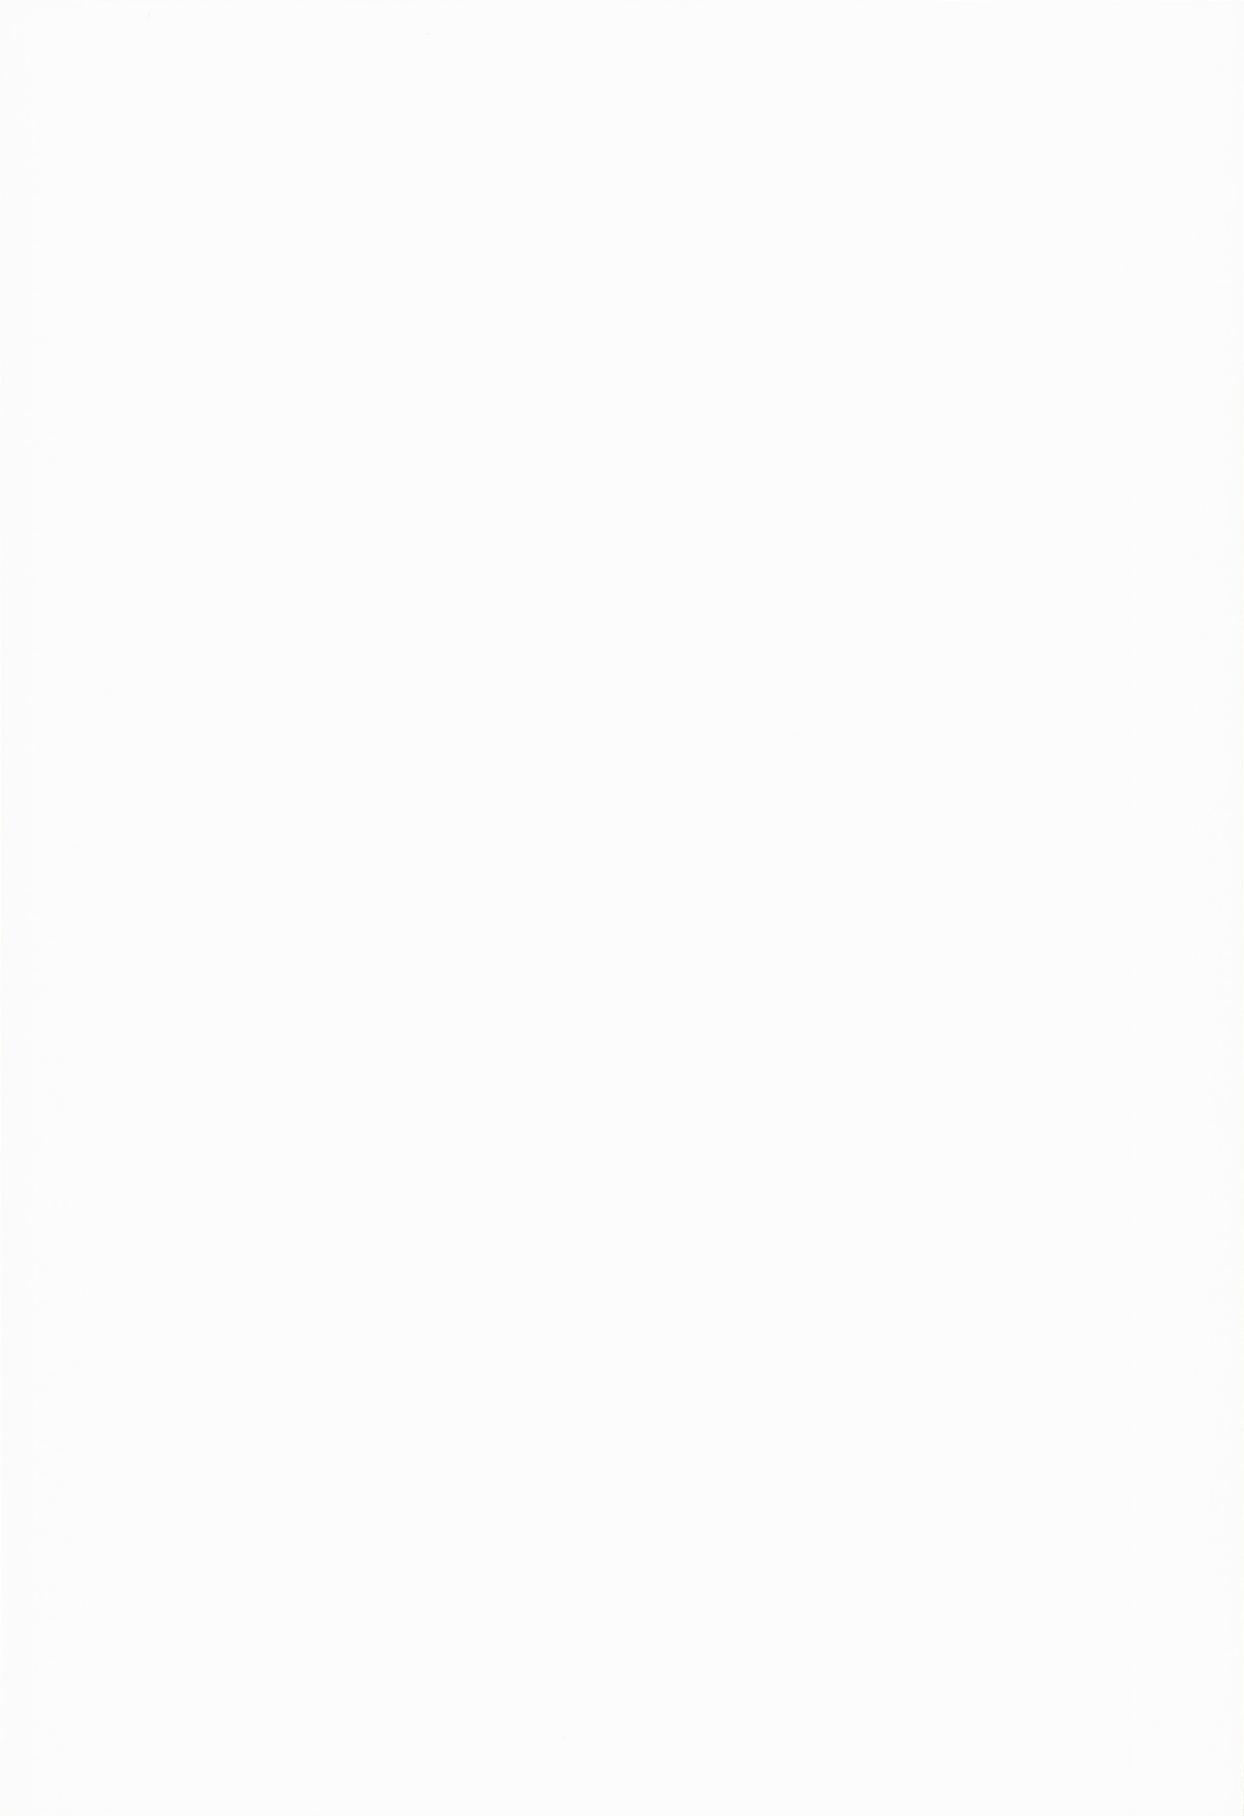 (COMIC1☆8) [Hisagoya (Momio,Miyamoto Issa,Shoukaki)] Gakuen wo Sukutta Kimo-ota Kishi sama ga Bisyoujo Ryu-musume to Ecchi na Koto suru Hon (Rage of Bahamut) 26